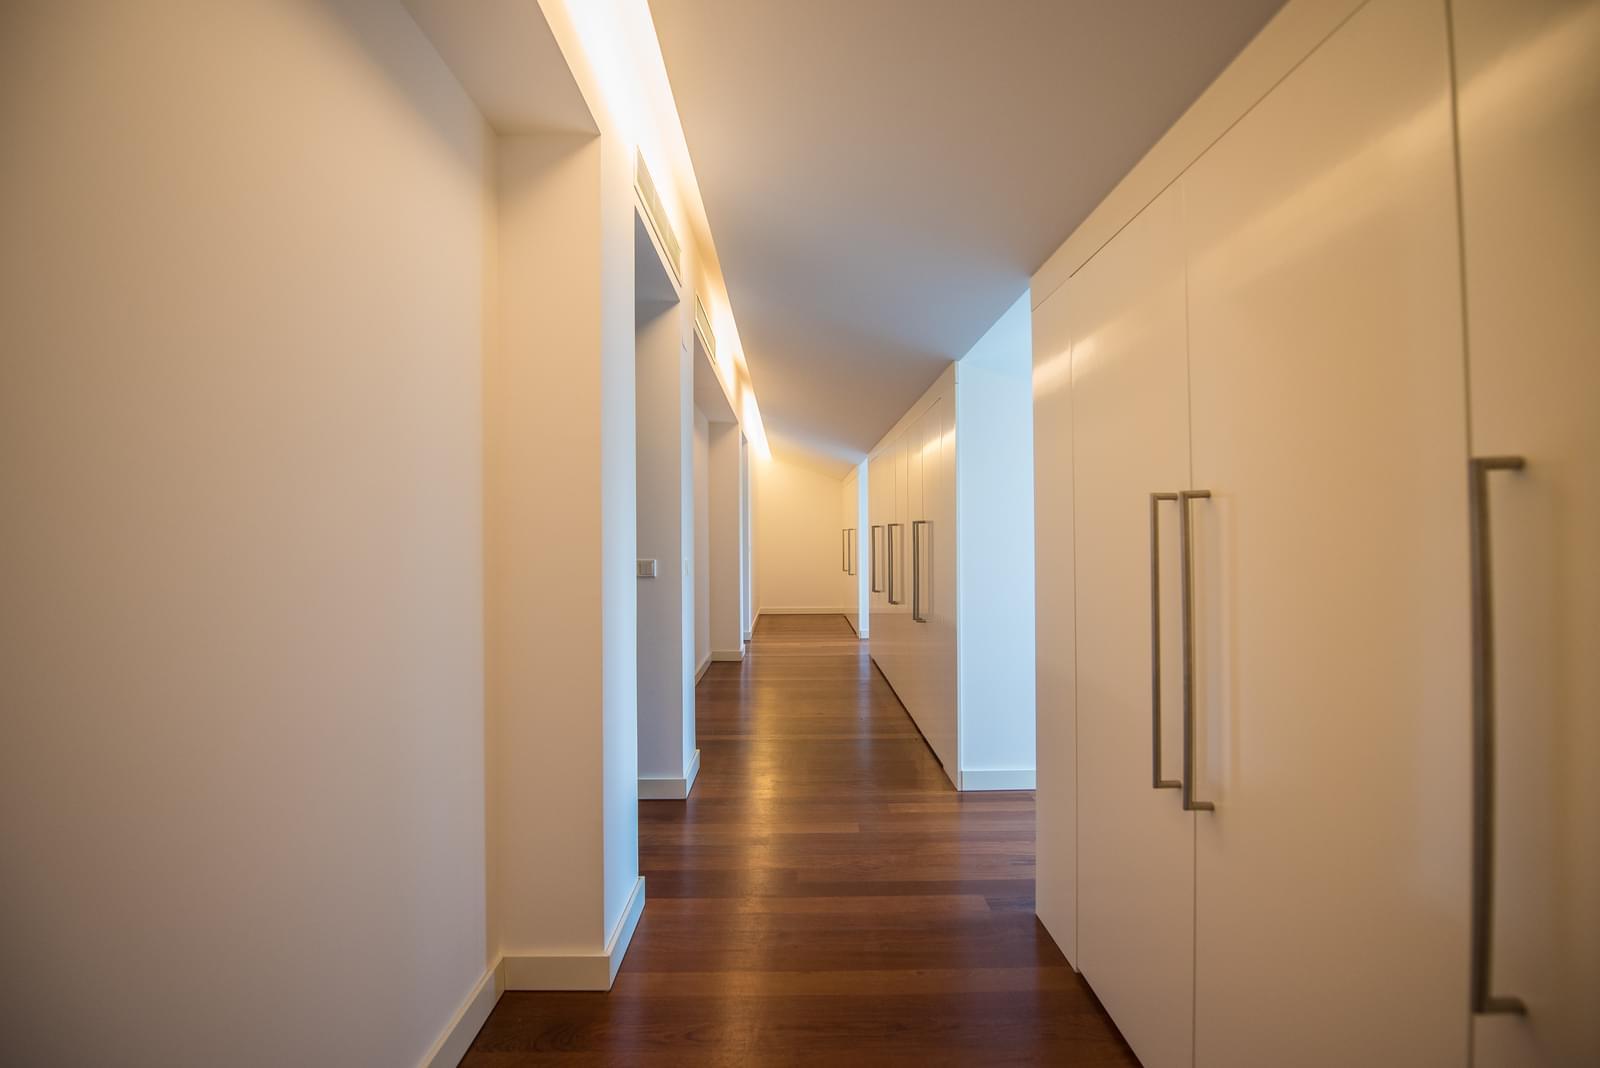 pf19211-apartamento-t4-lisboa-5552a3ae-69c7-4685-b335-fefe9415836e